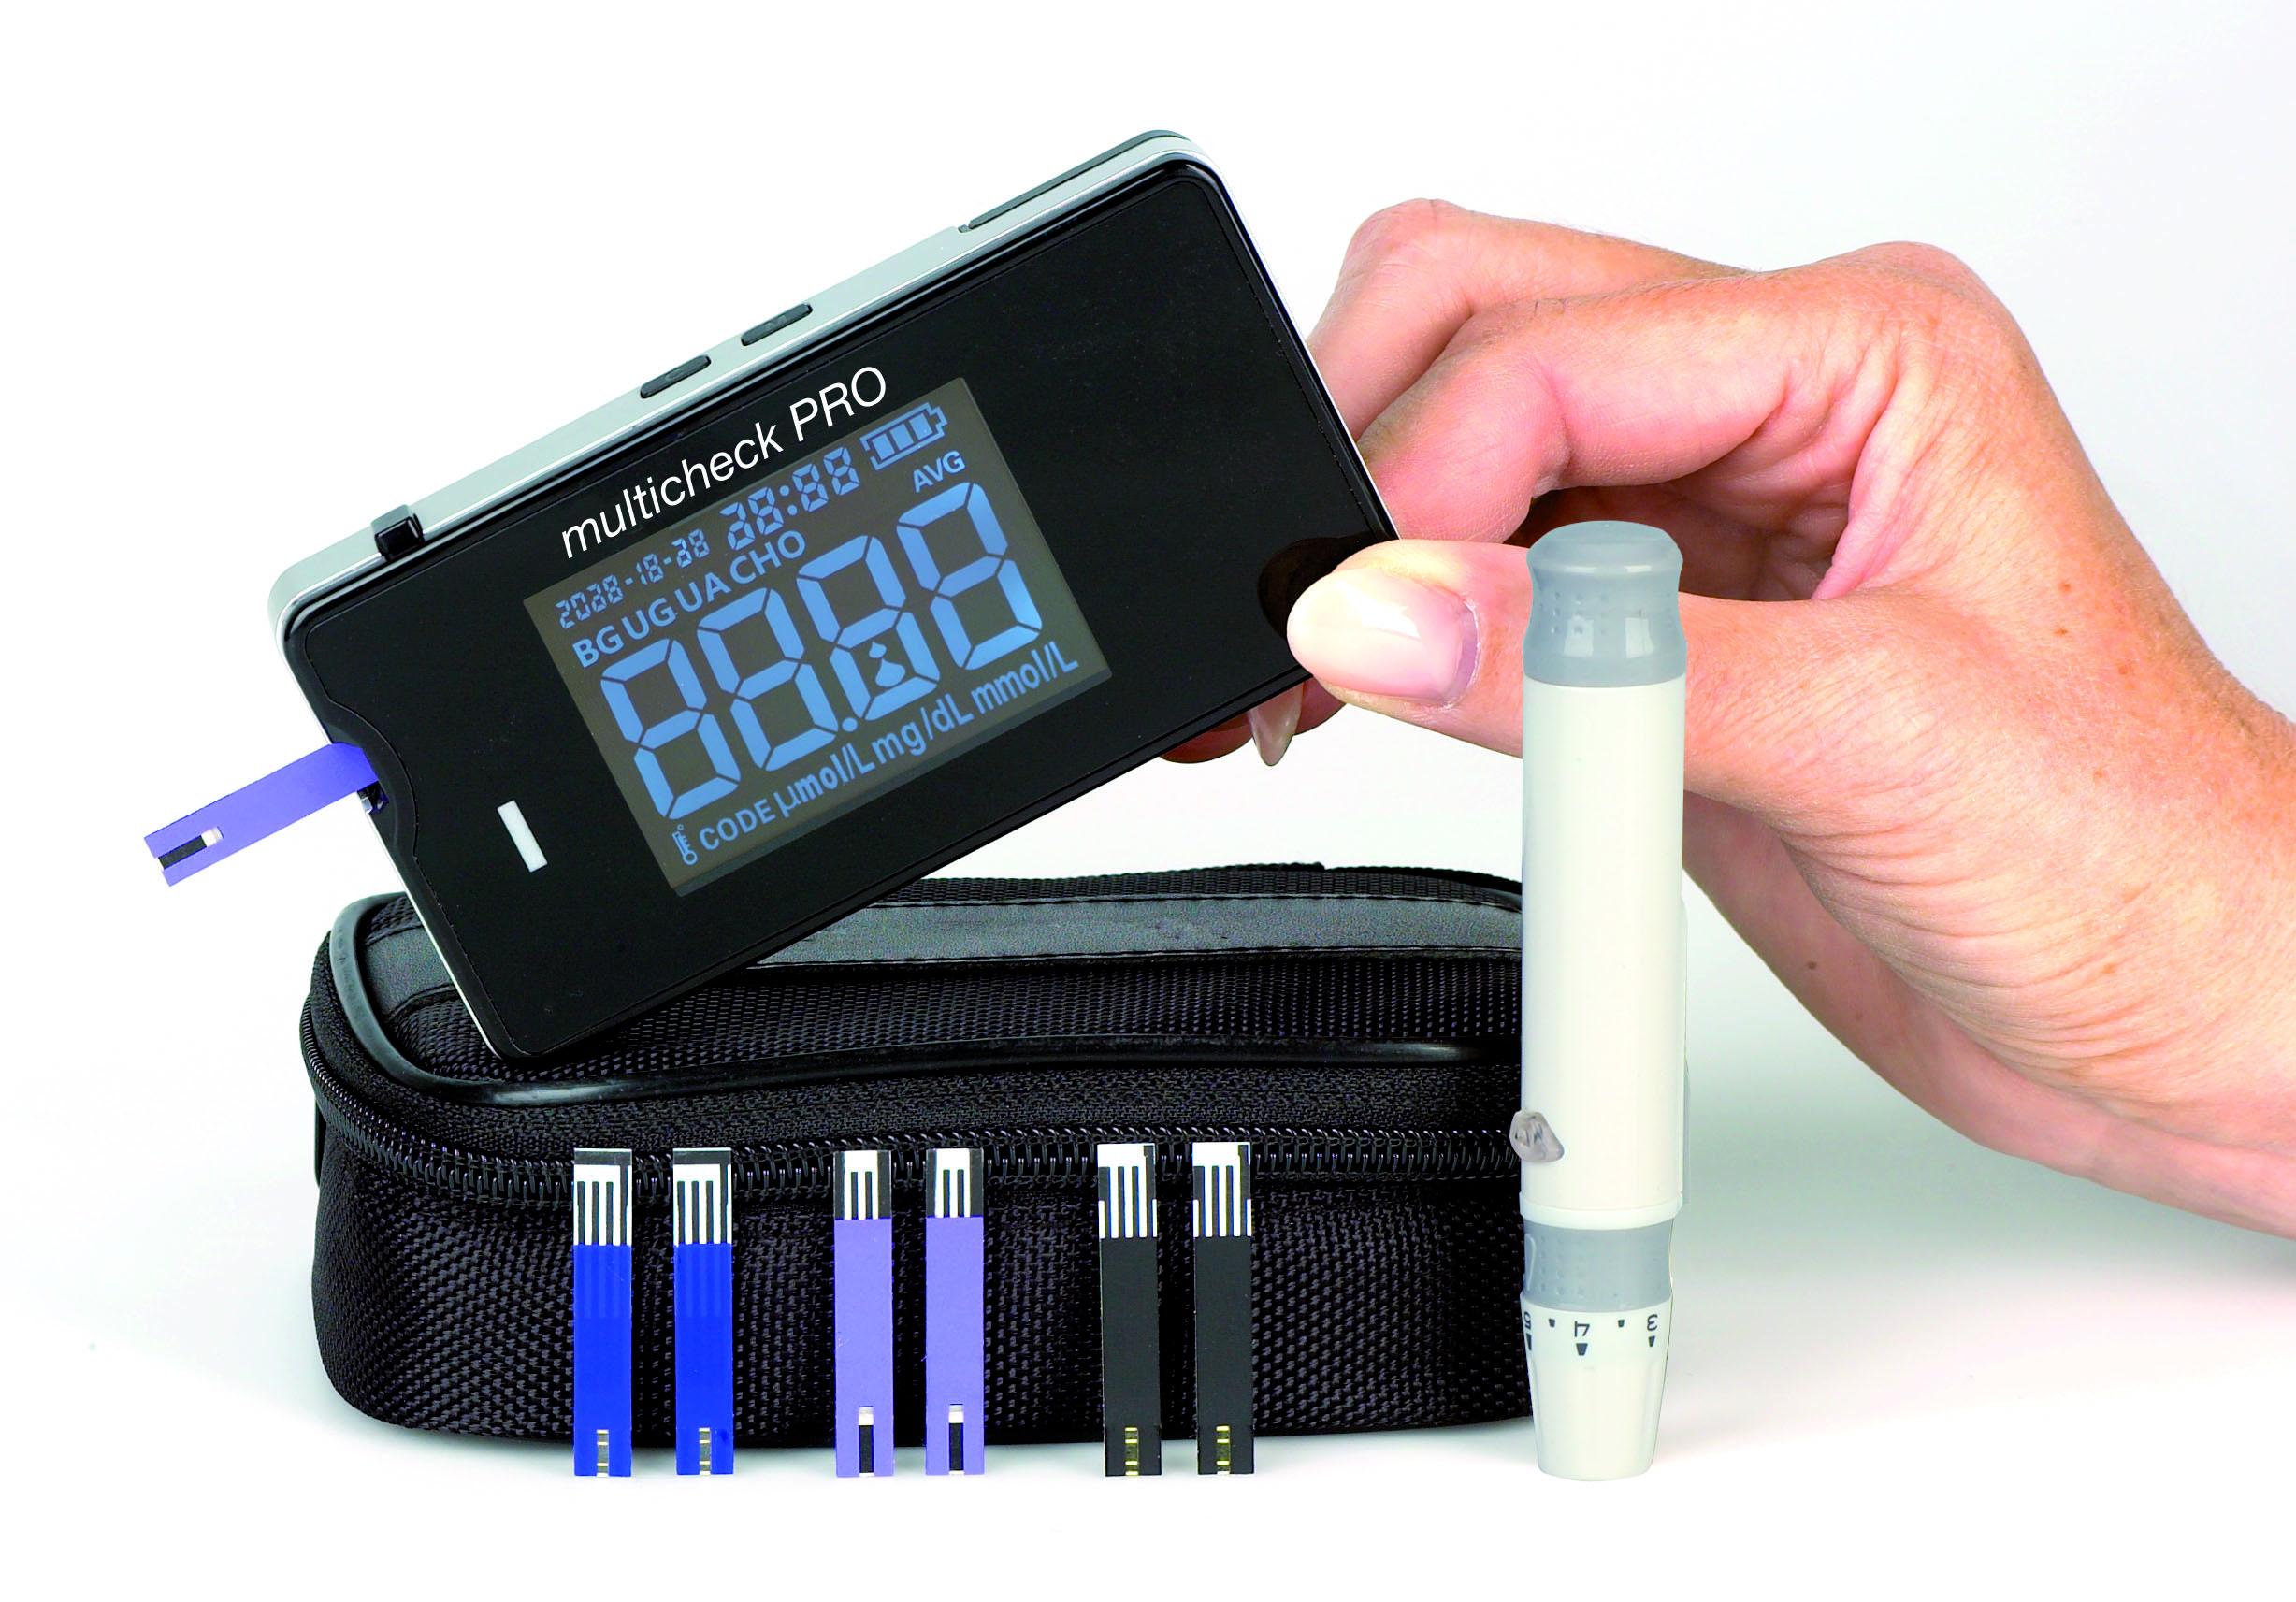 Multicheck PRO Cholesterol Sensoren, 10 Stück